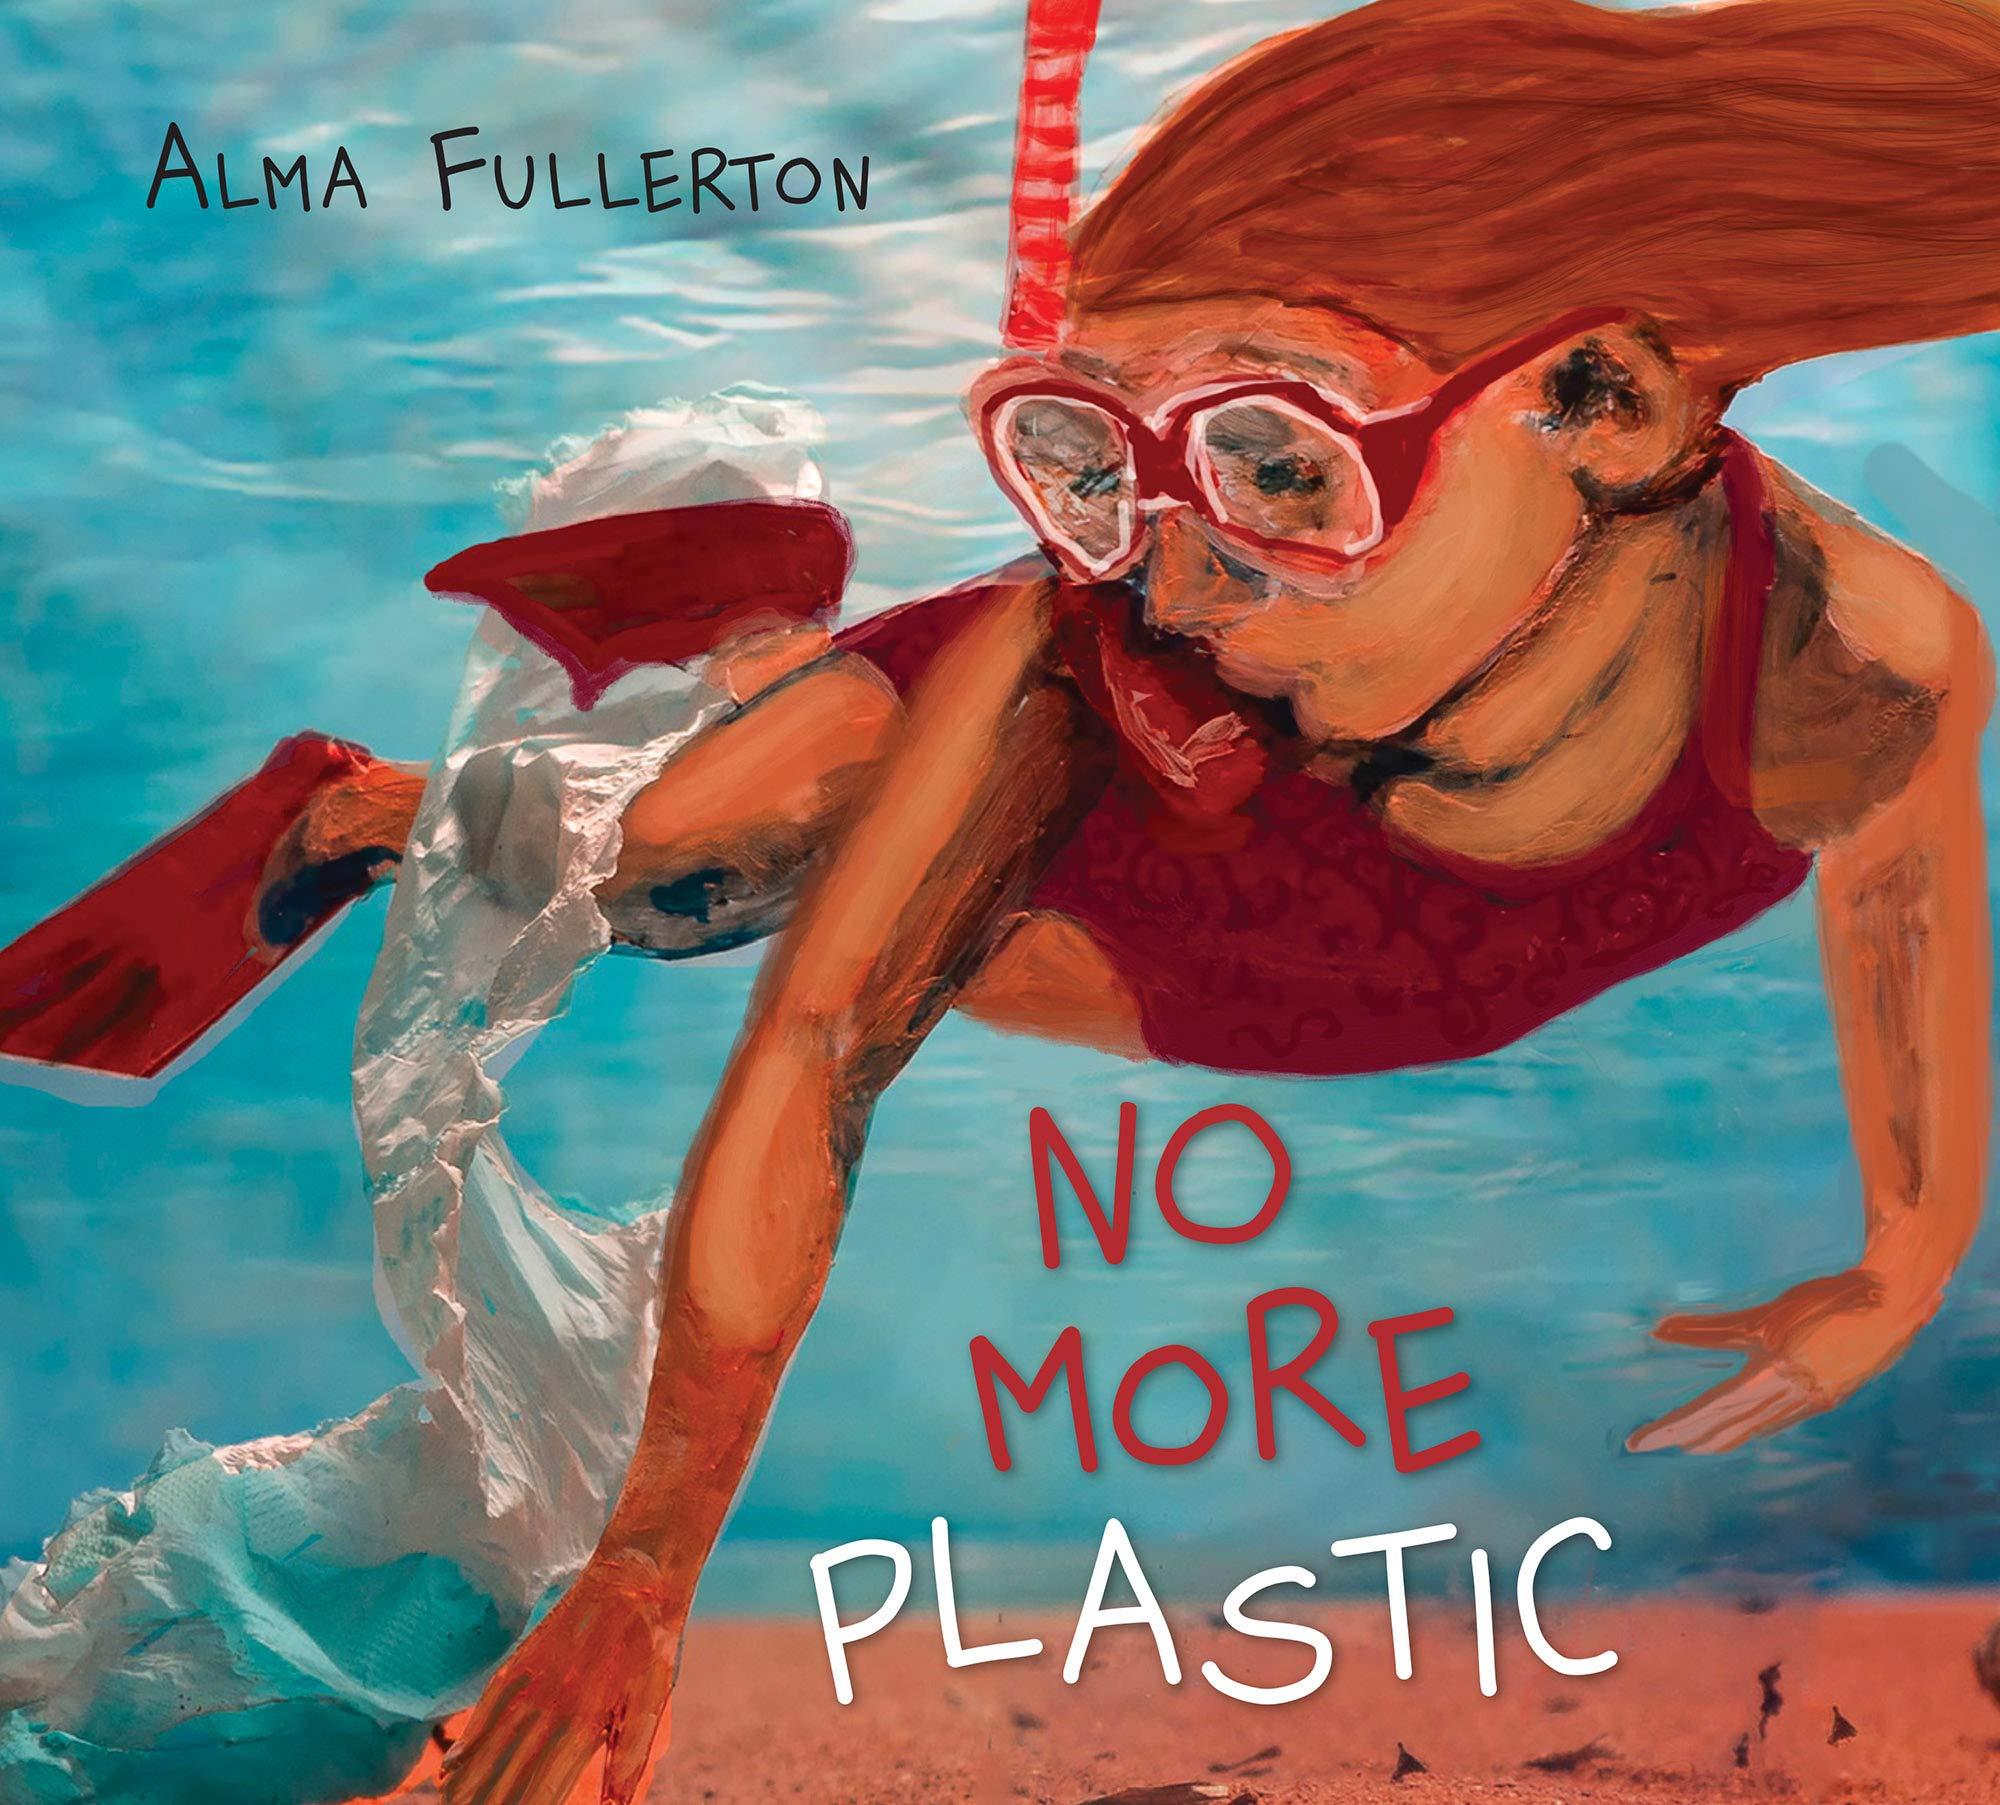 No More Plastic: Fullerton, Alma, Fullerton, Alma: 9781772781137:  Amazon.com: Books